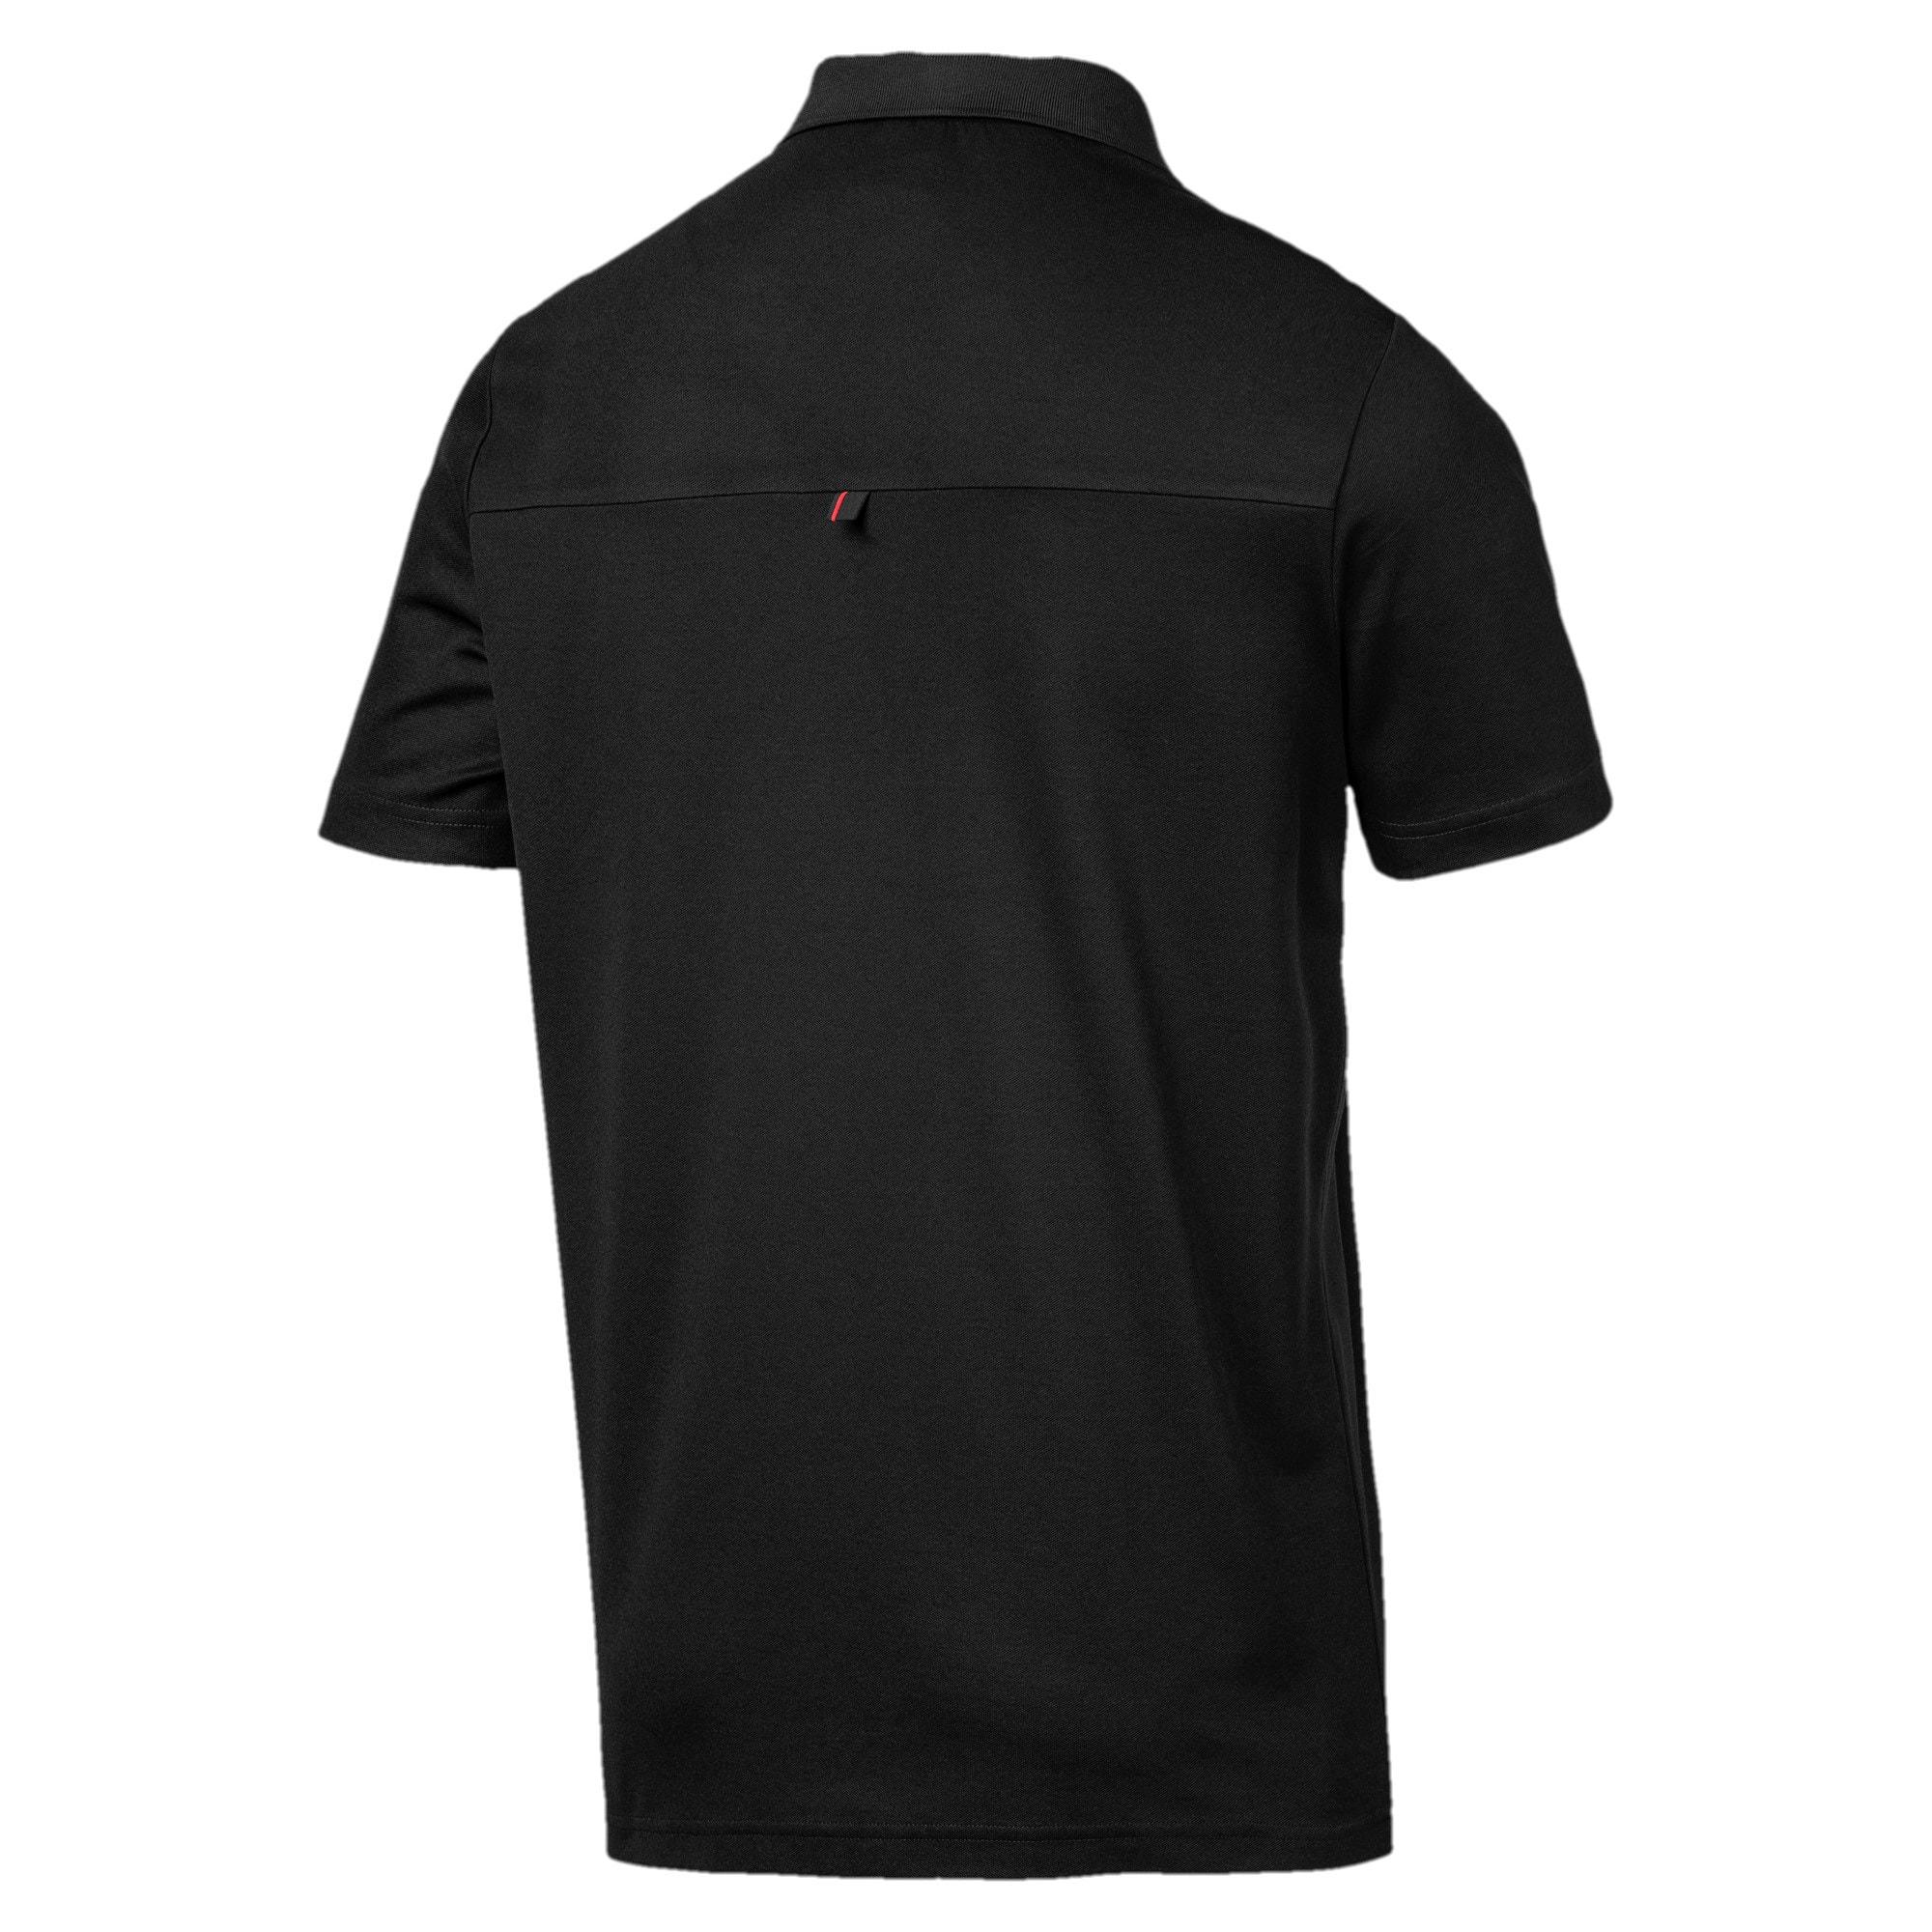 Thumbnail 6 of Ferrari Men's Polo Shirt, Puma Black, medium